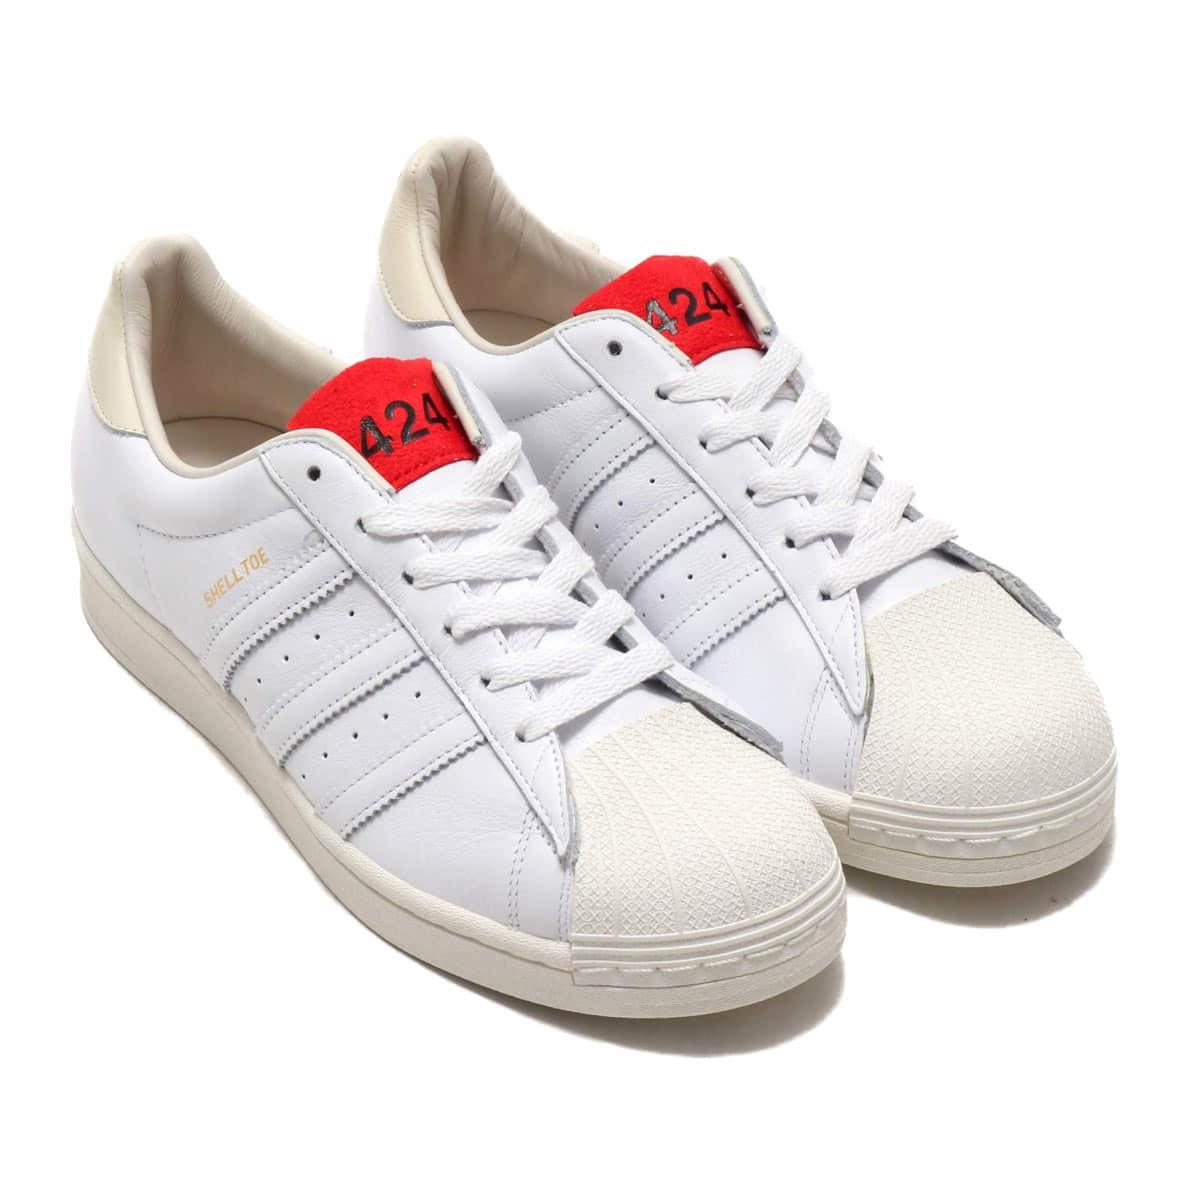 adidas 424 SHELLTOE CORE WHITE/CORE WHITE/SCARLET 20SS-S_photo_large